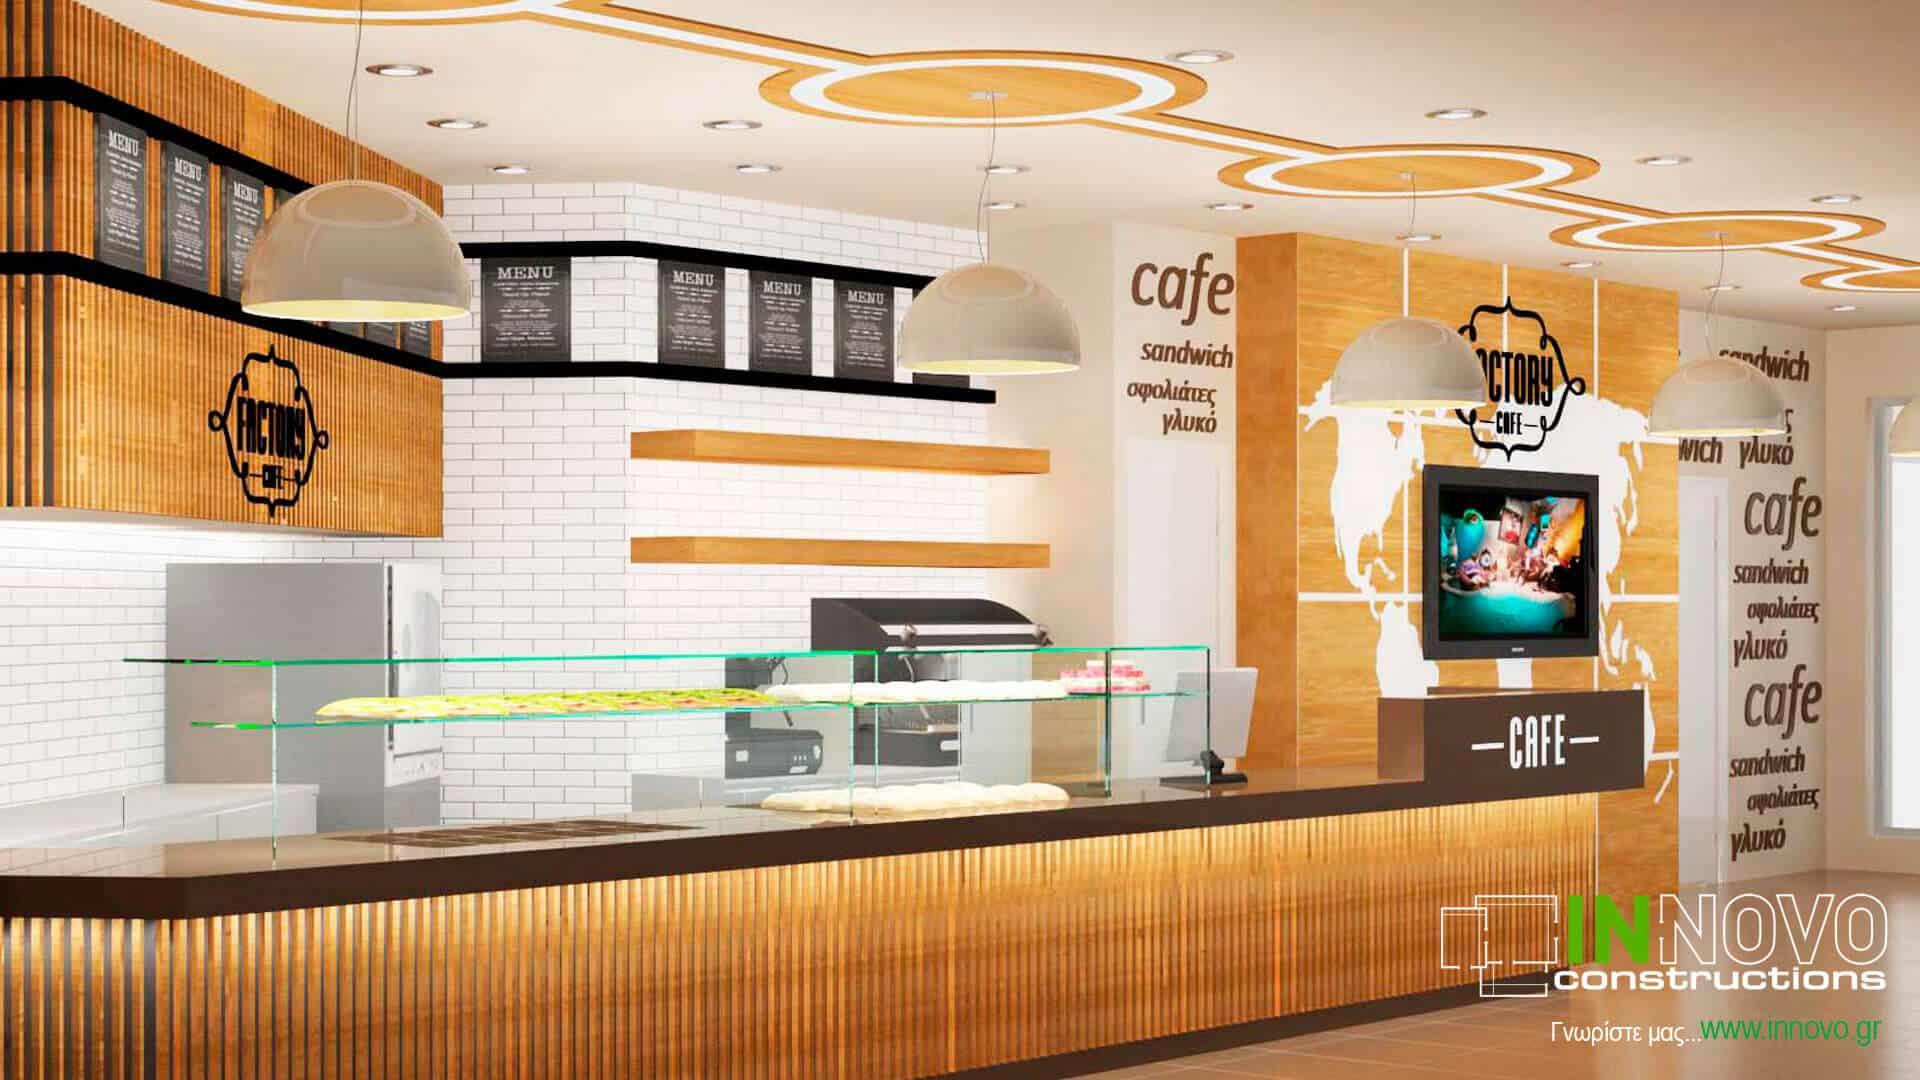 kataskevi-snack-cafe-construction-snack-gerakas-1842-3